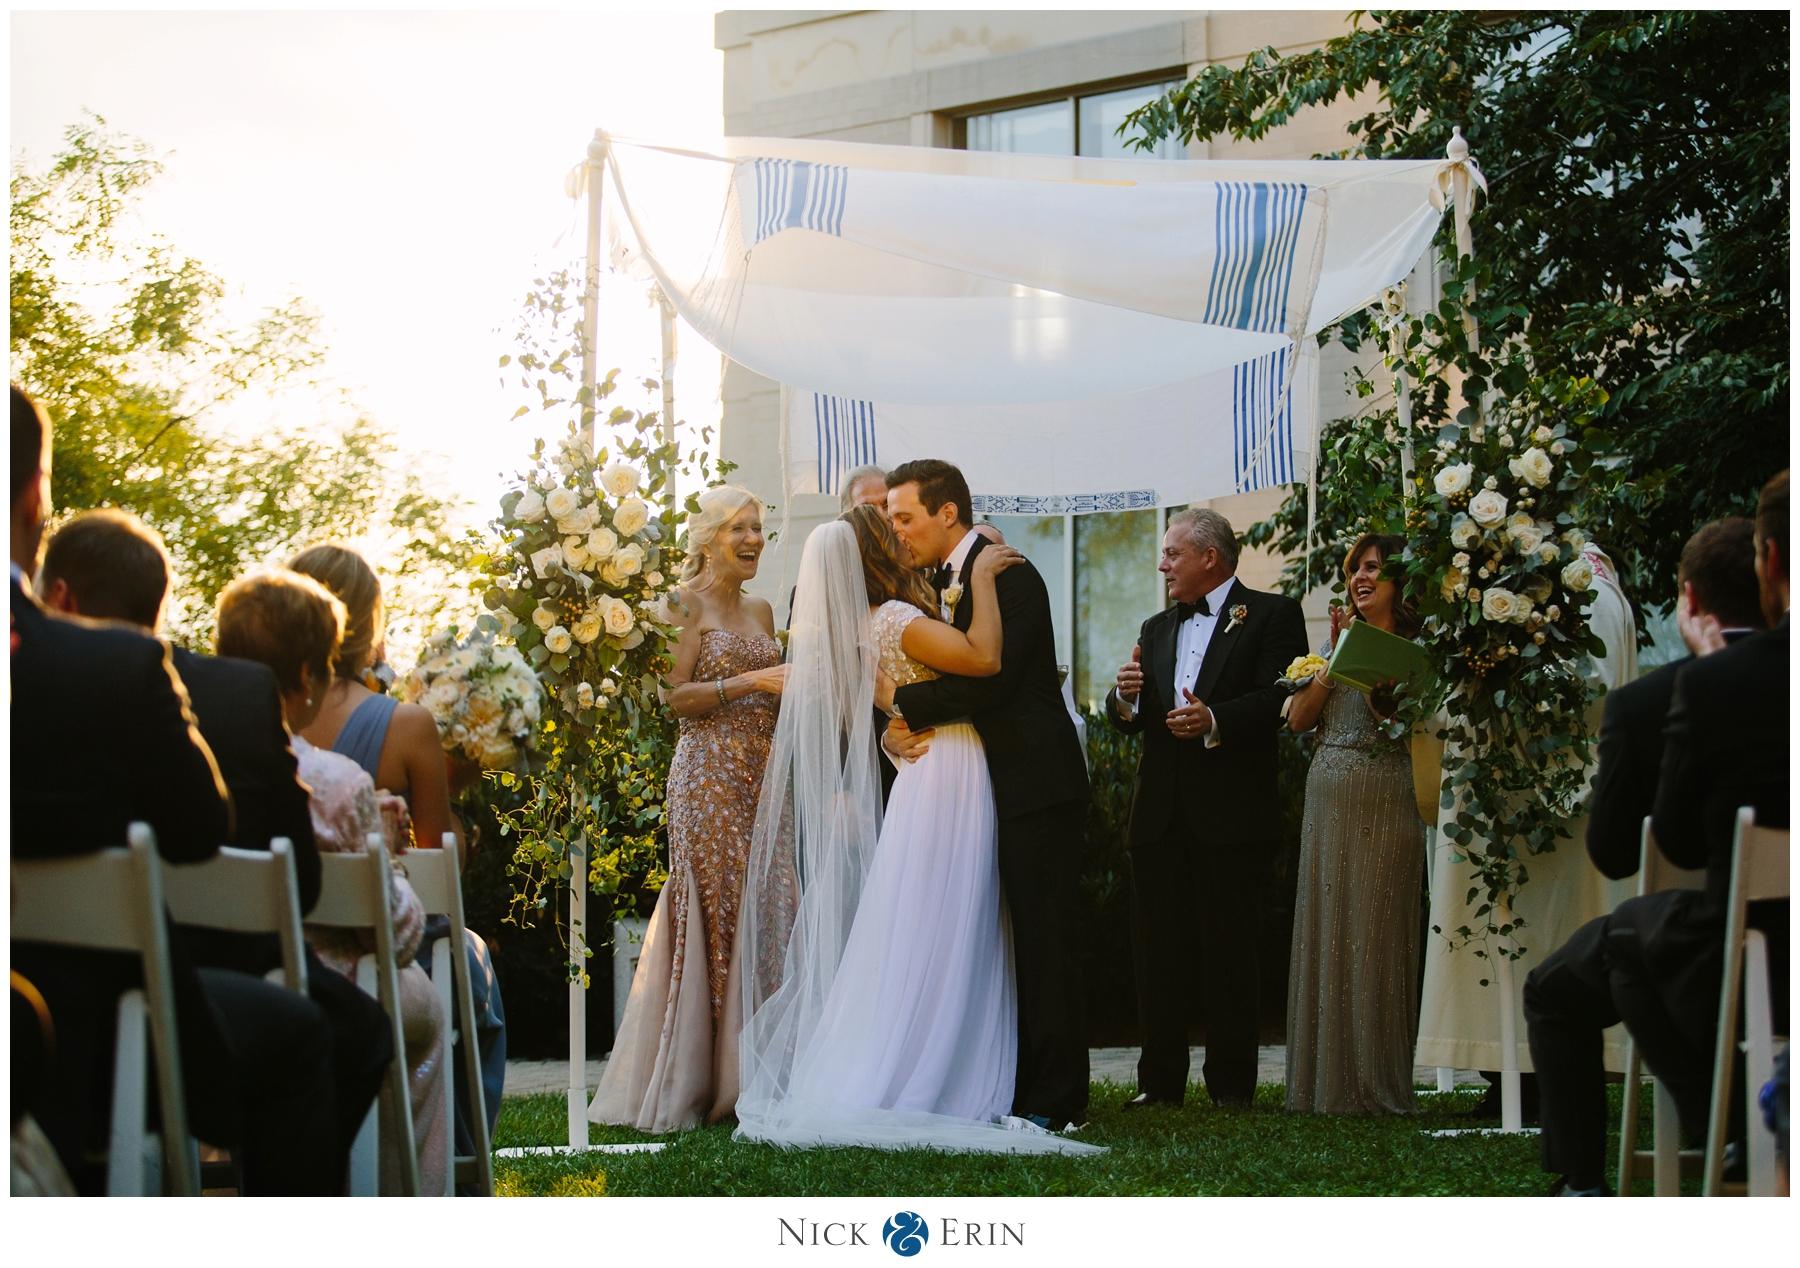 donner_photography_washington-dc-wedding_ariel-patrick_0058